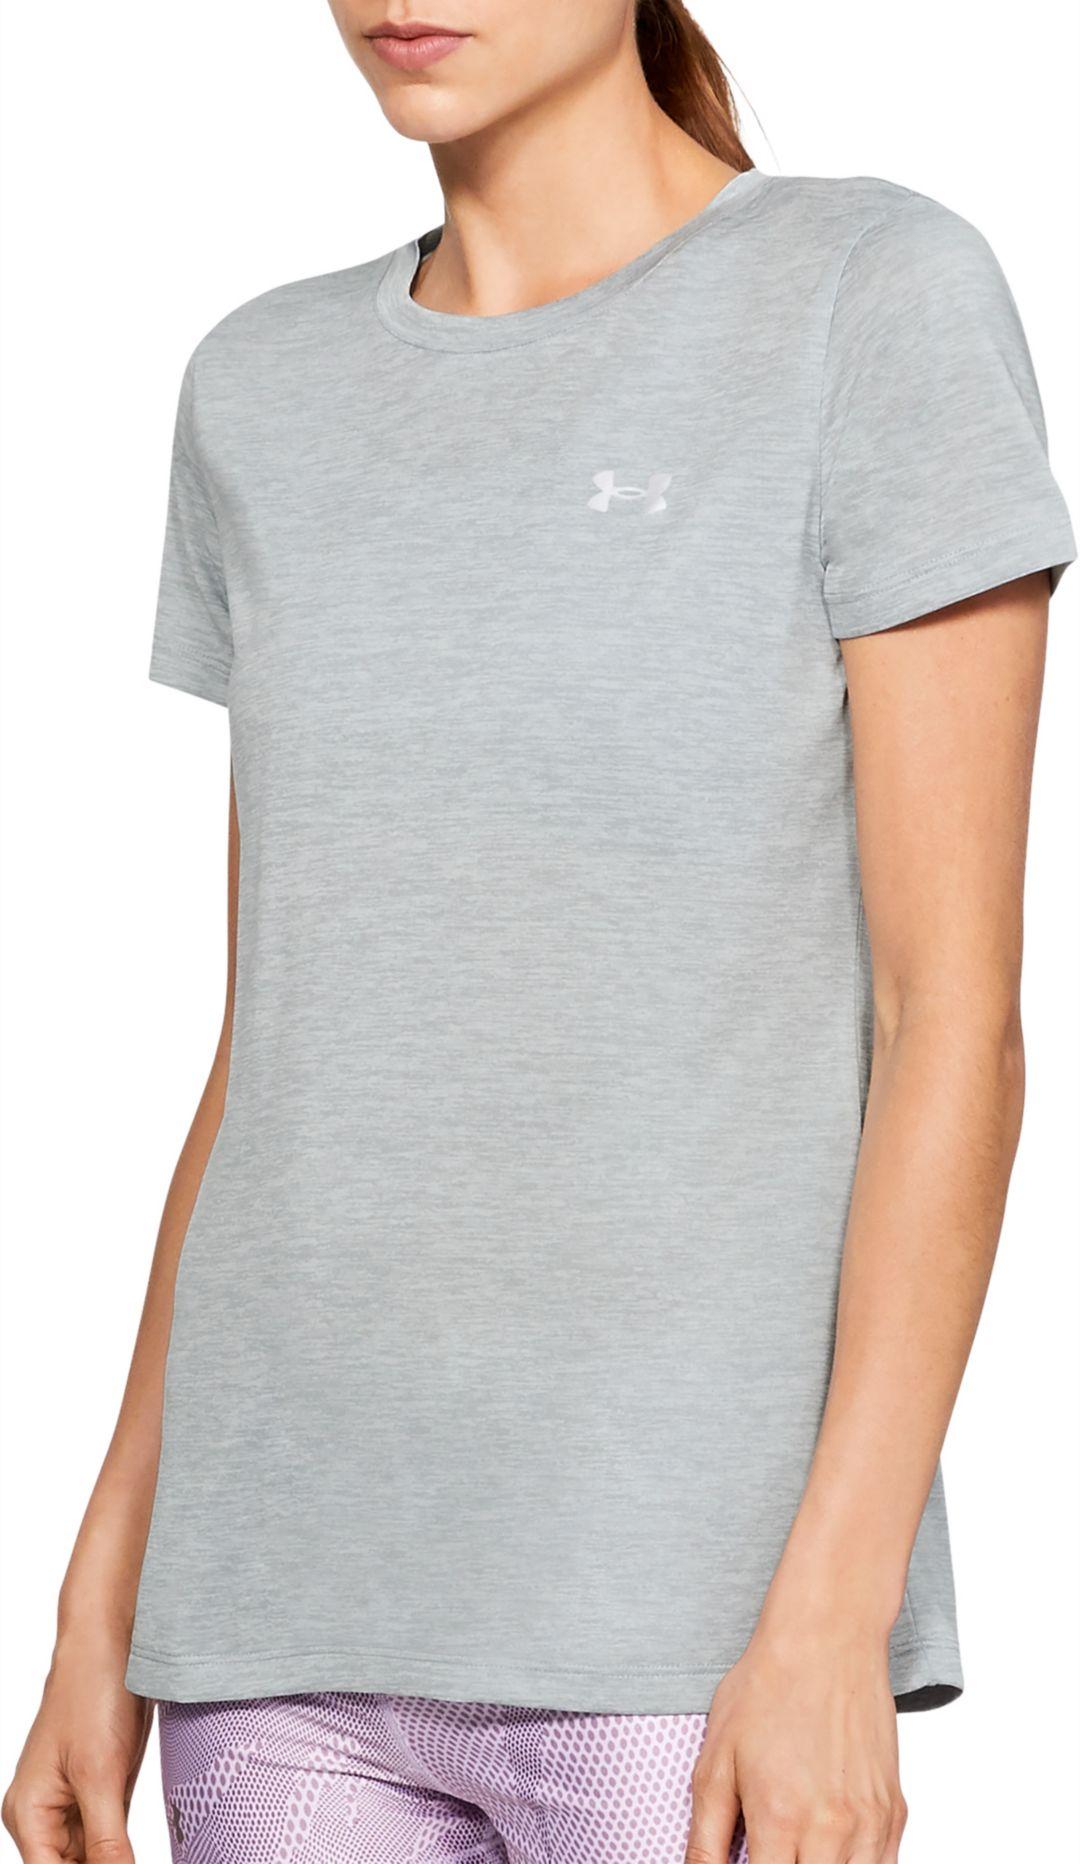 b269b59a Under Armour Women's Tech Twist Print Crewneck T-Shirt   DICK'S ...